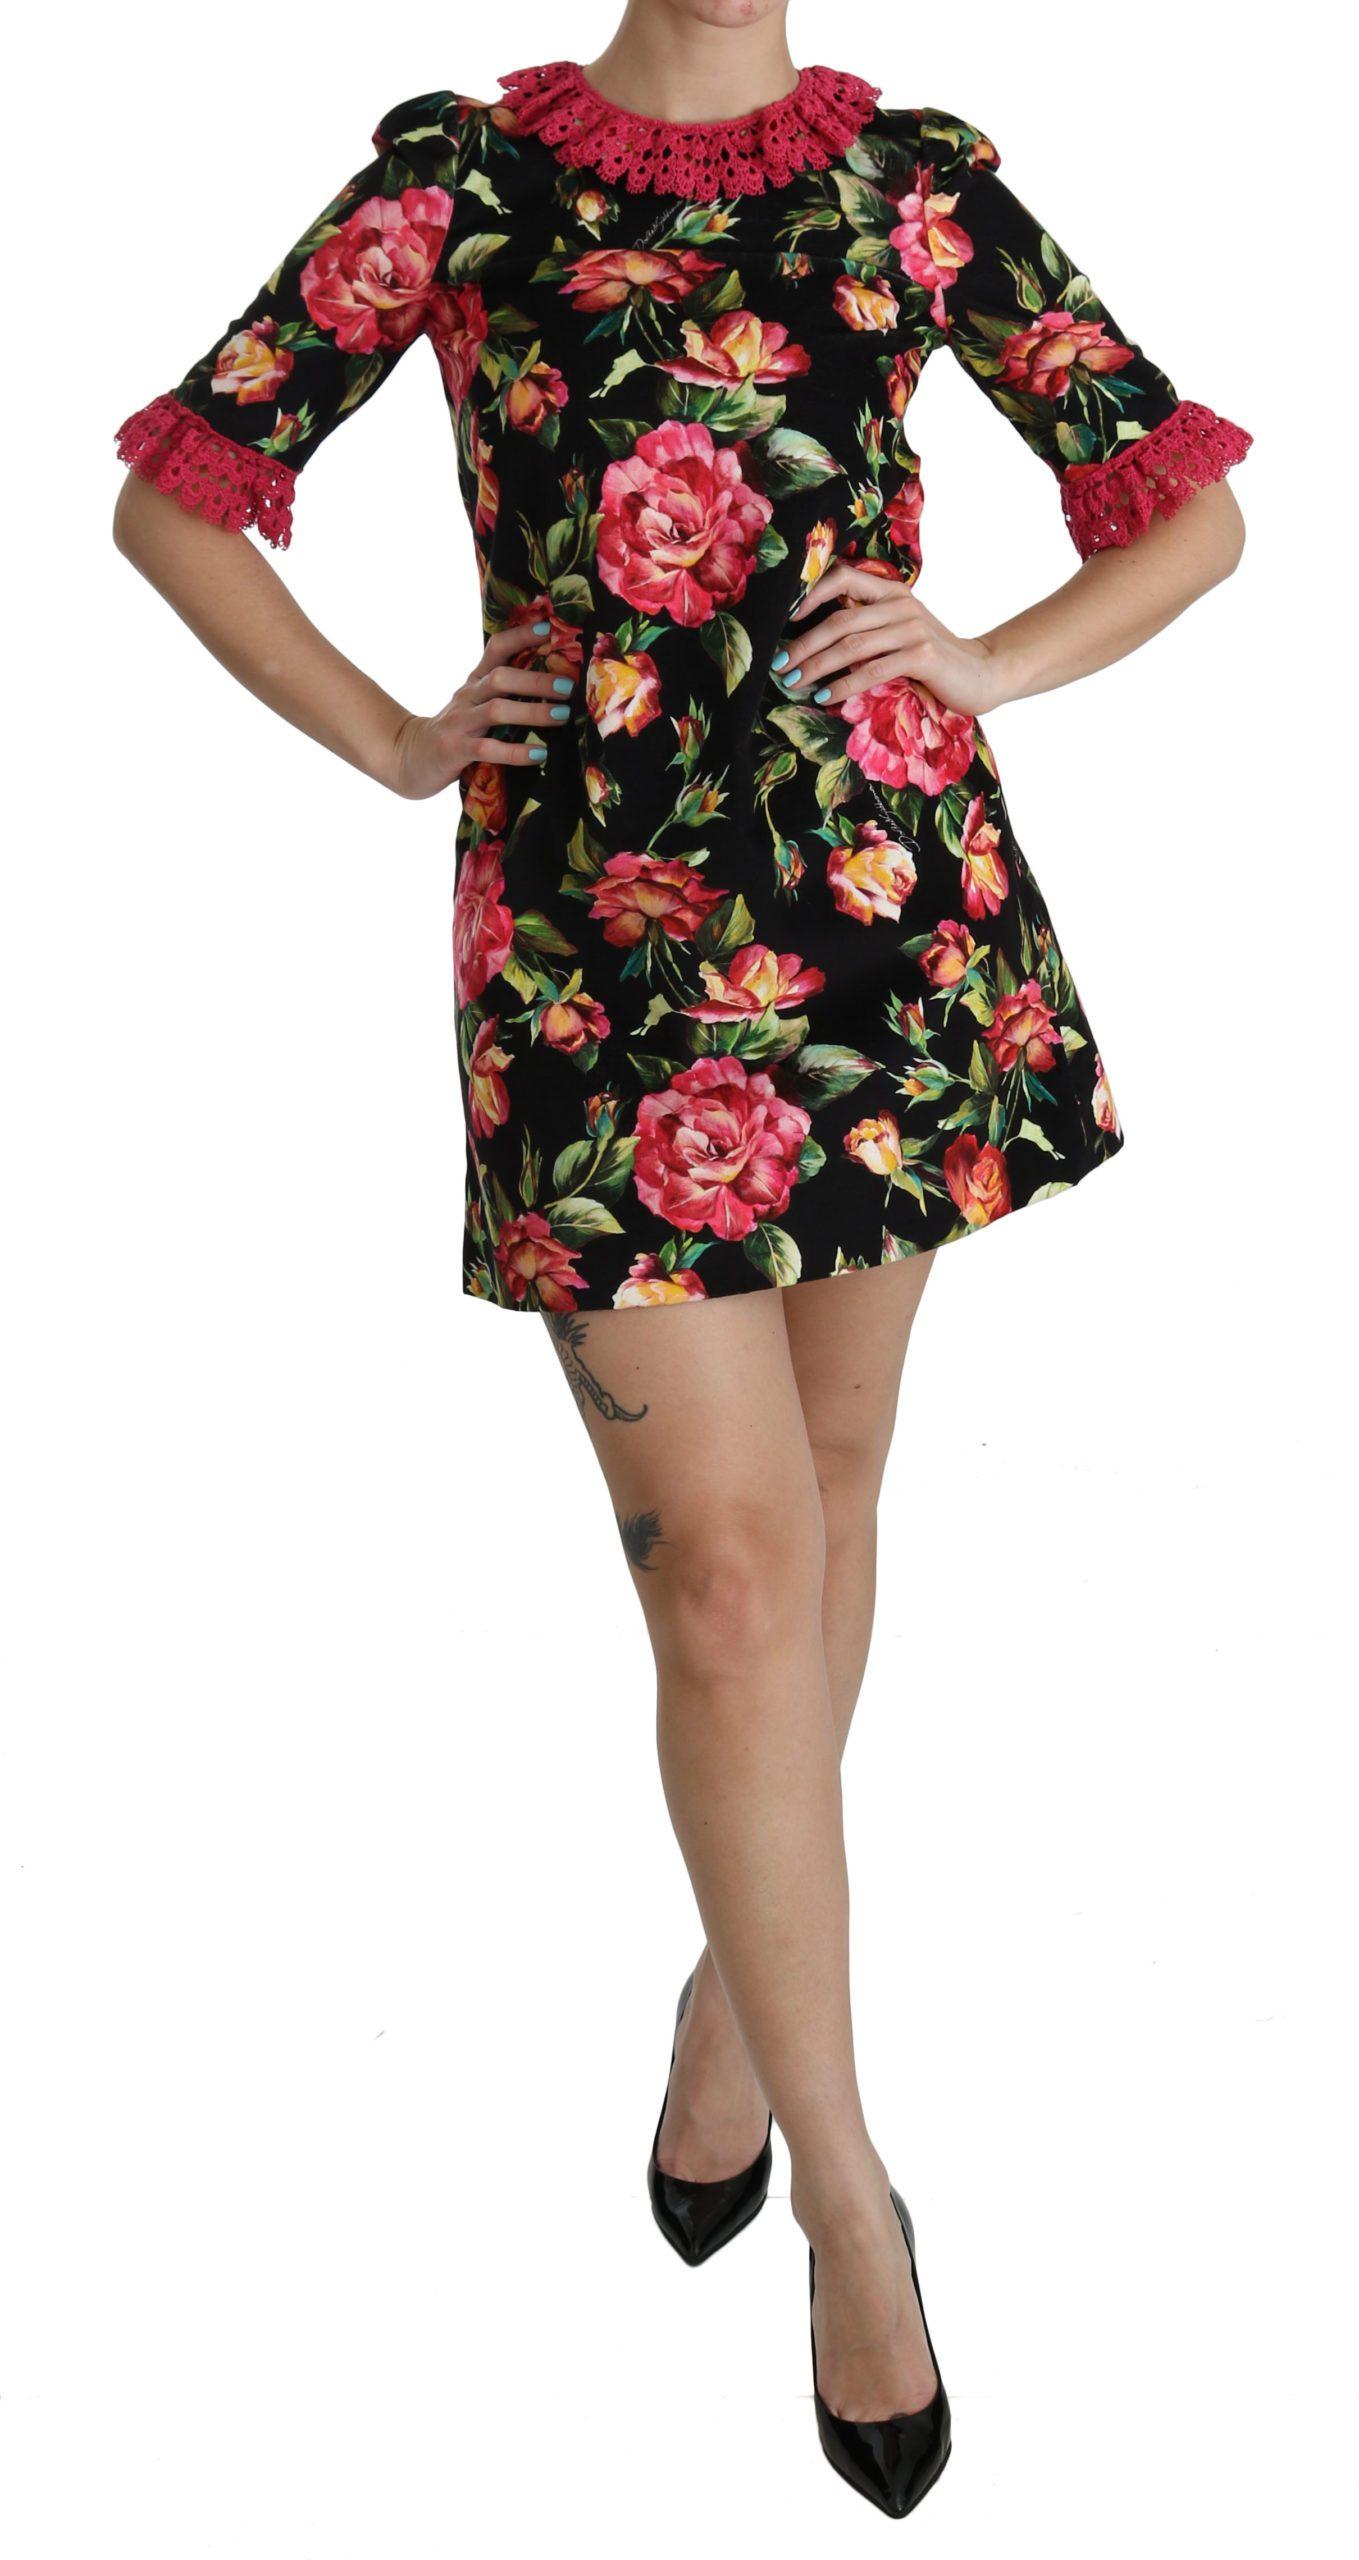 Dolce & Gabbana Women's Lace A-Line Shift Mini Dress Black DR2085 - IT38 XS